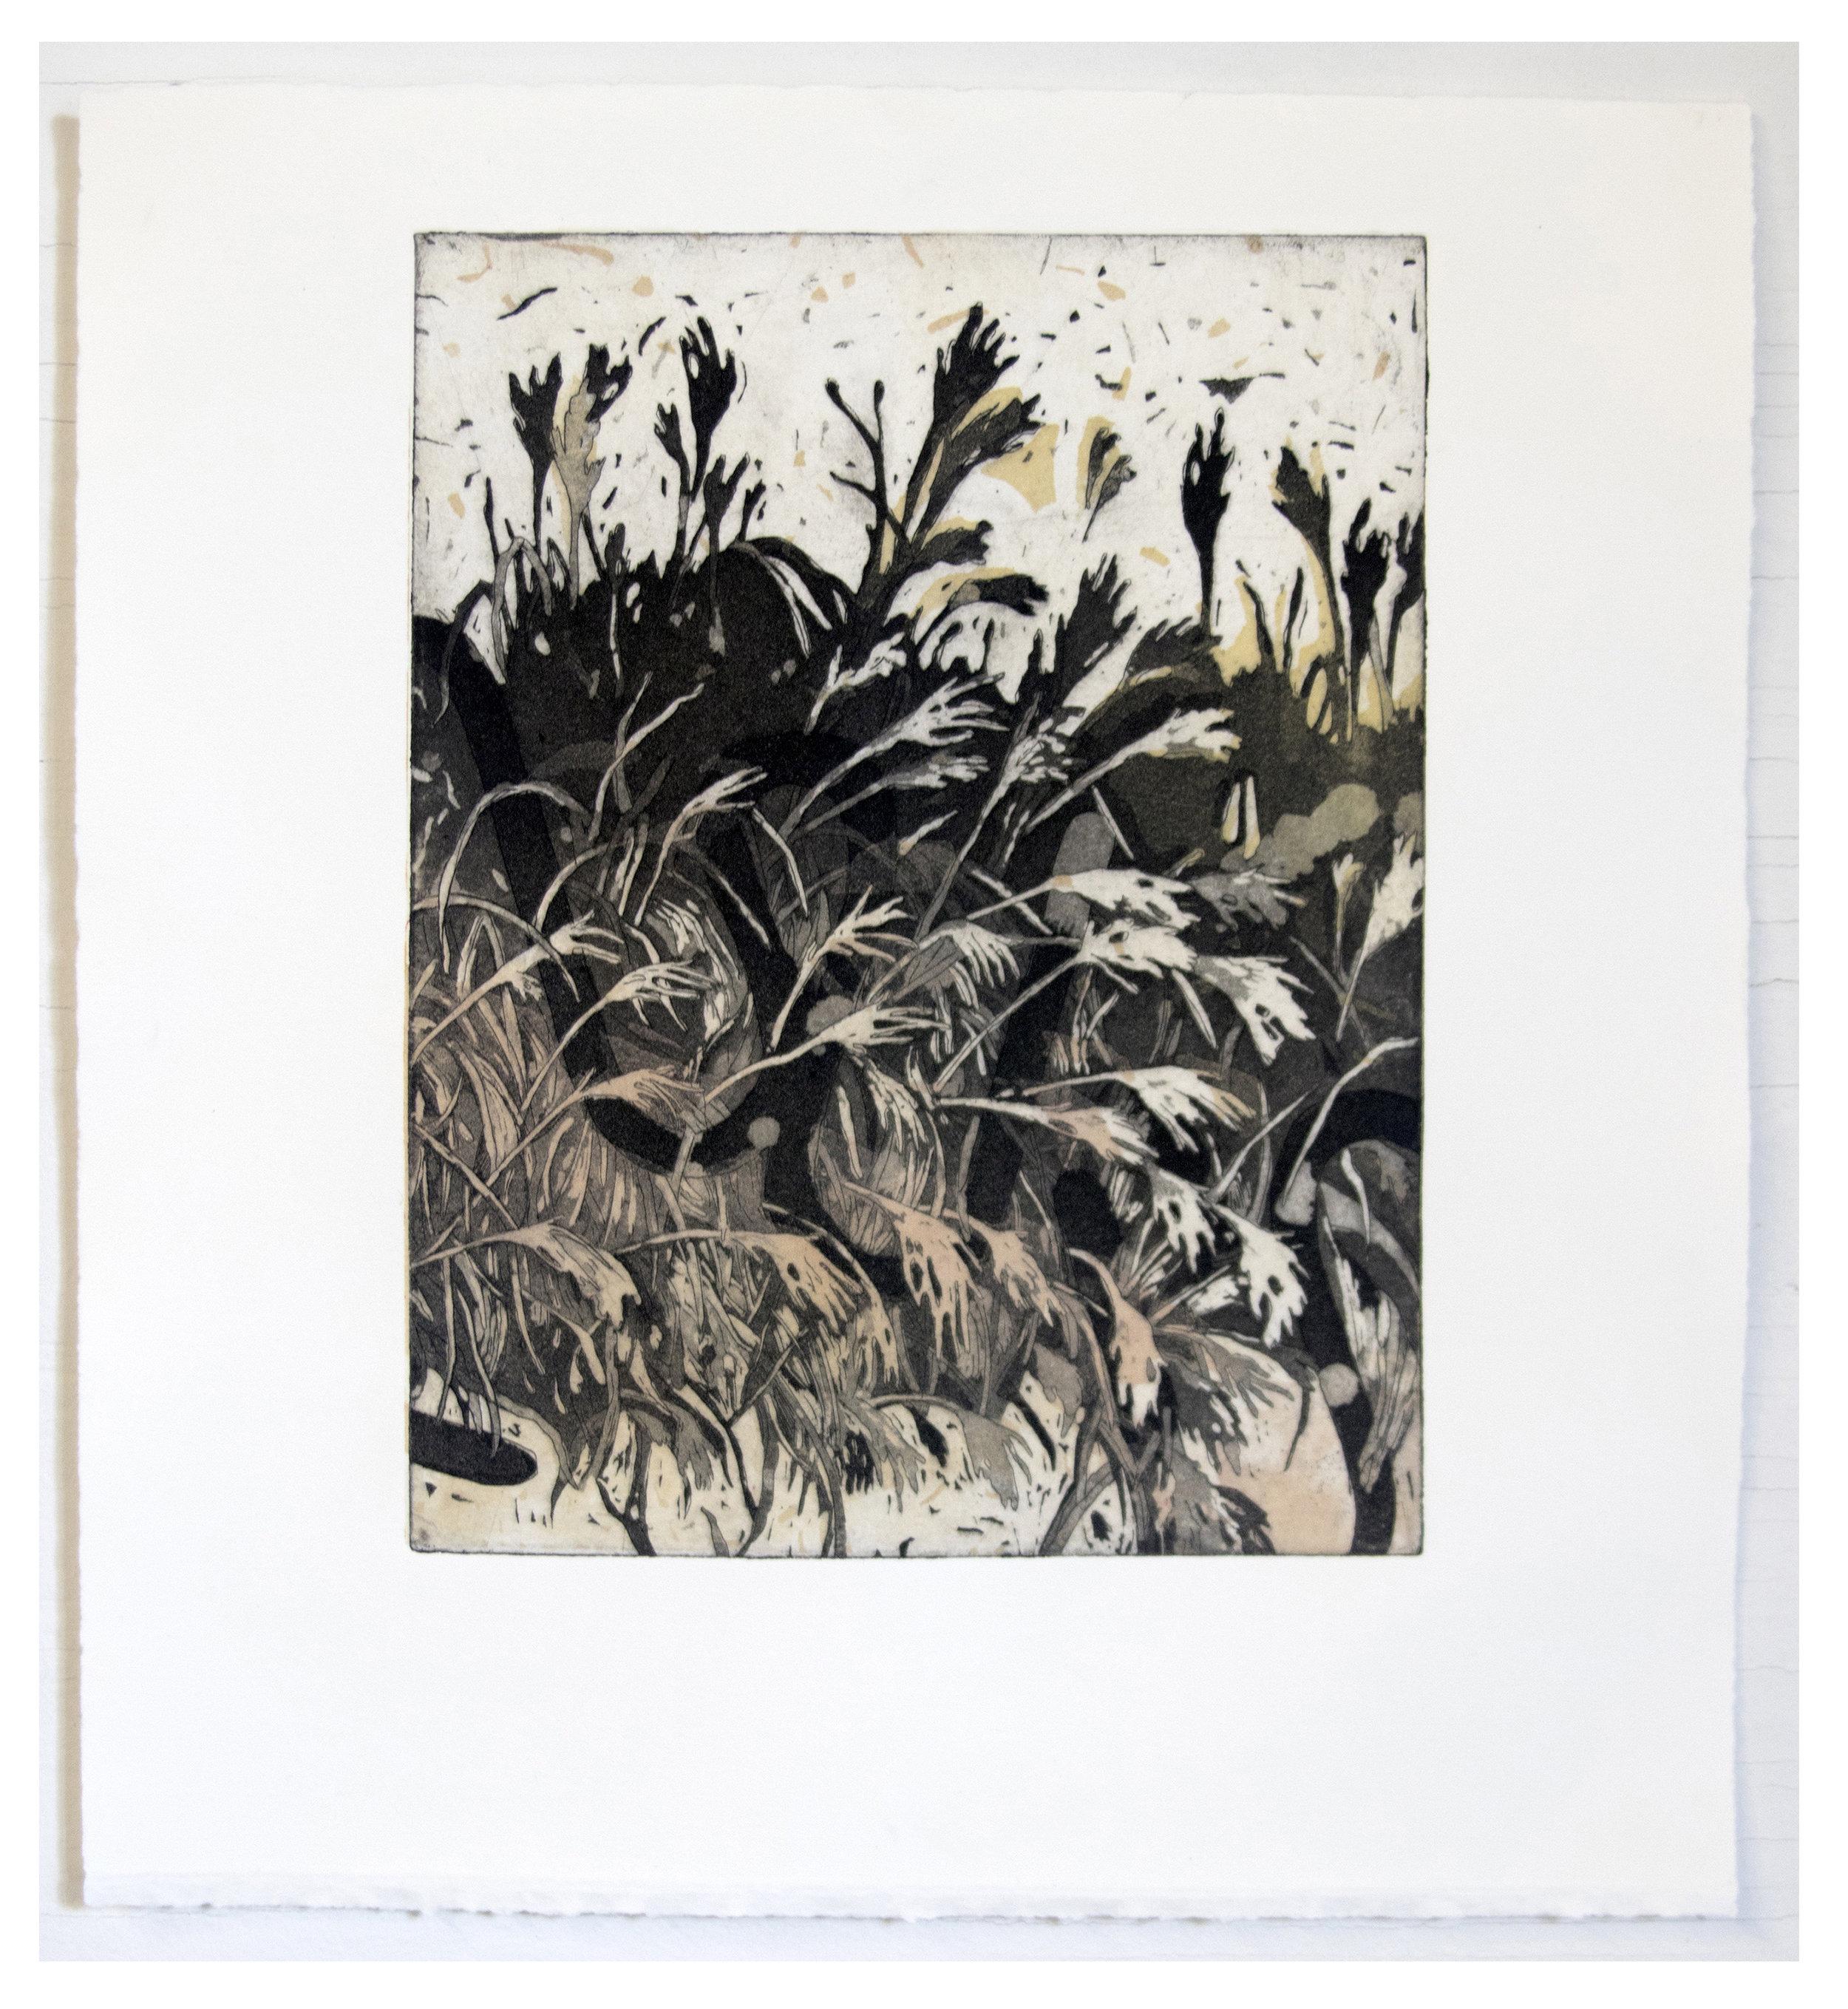 Bran. N. Grain ; Intaglio and Screen-print, 11''x14'', 2017